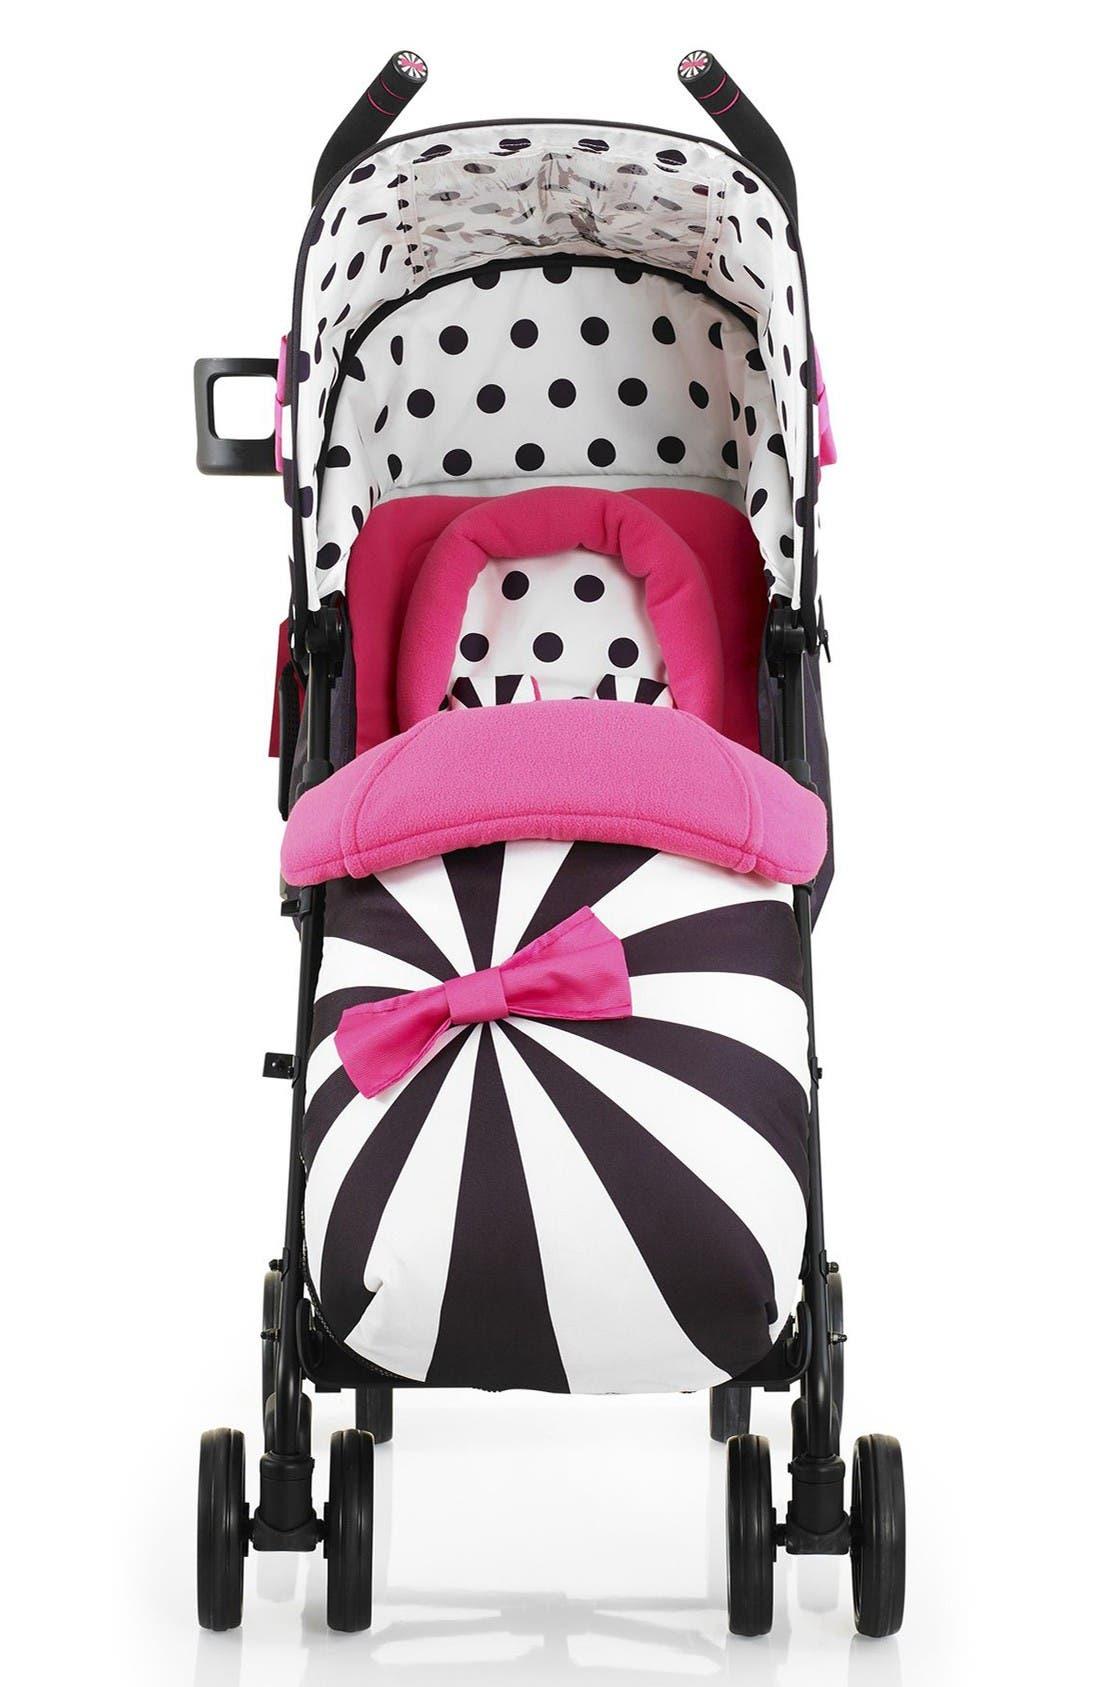 Main Image - Cosatto Supa Golightly 2 Stroller